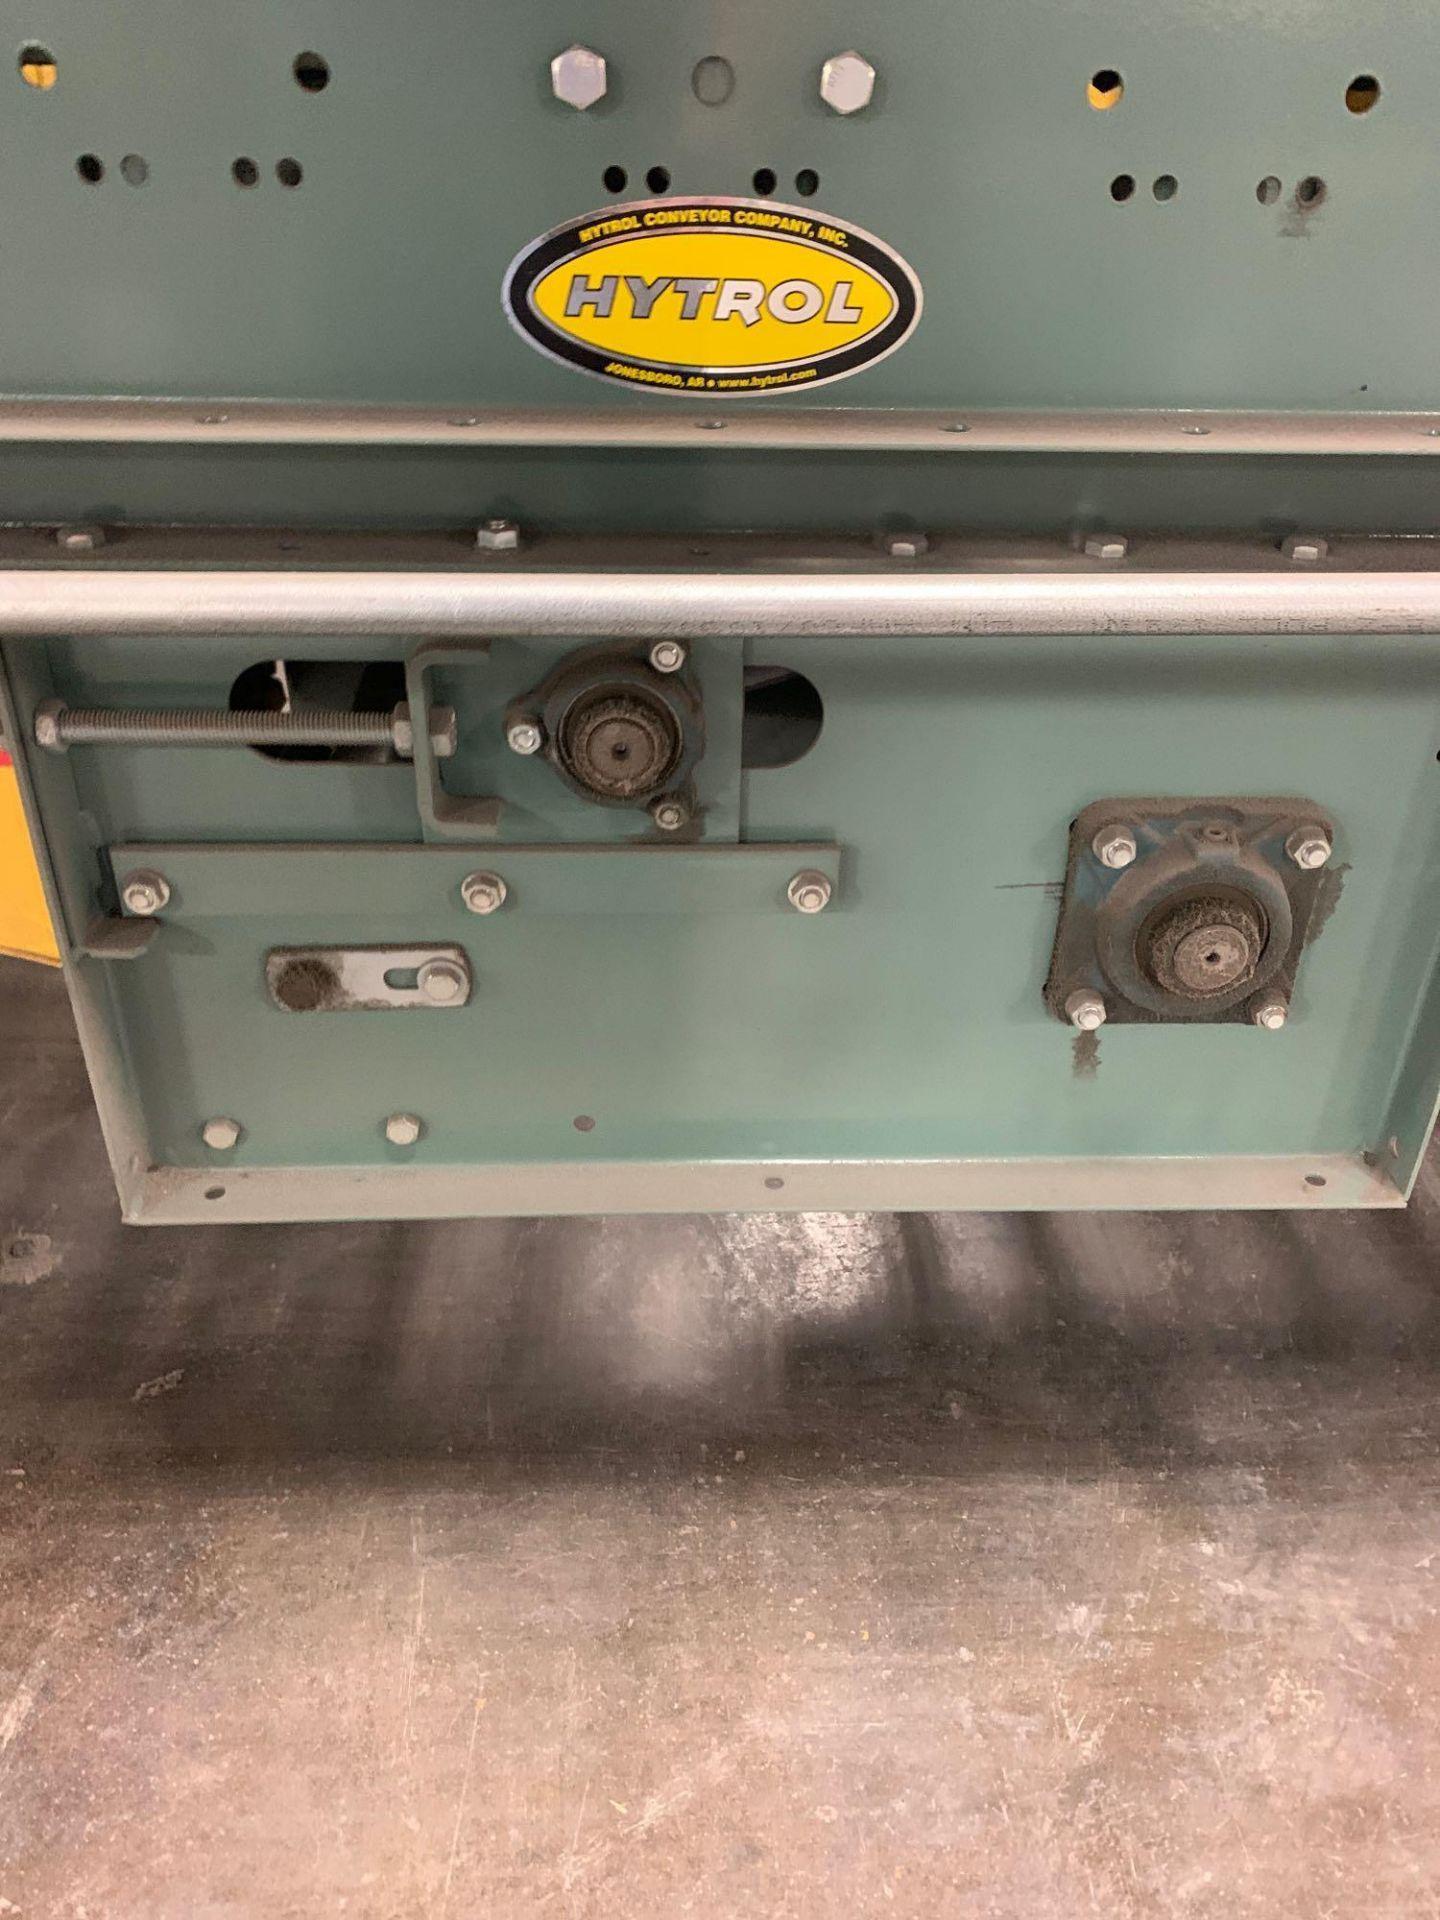 Hytrol 24' Conveyor Line Section - Image 4 of 6